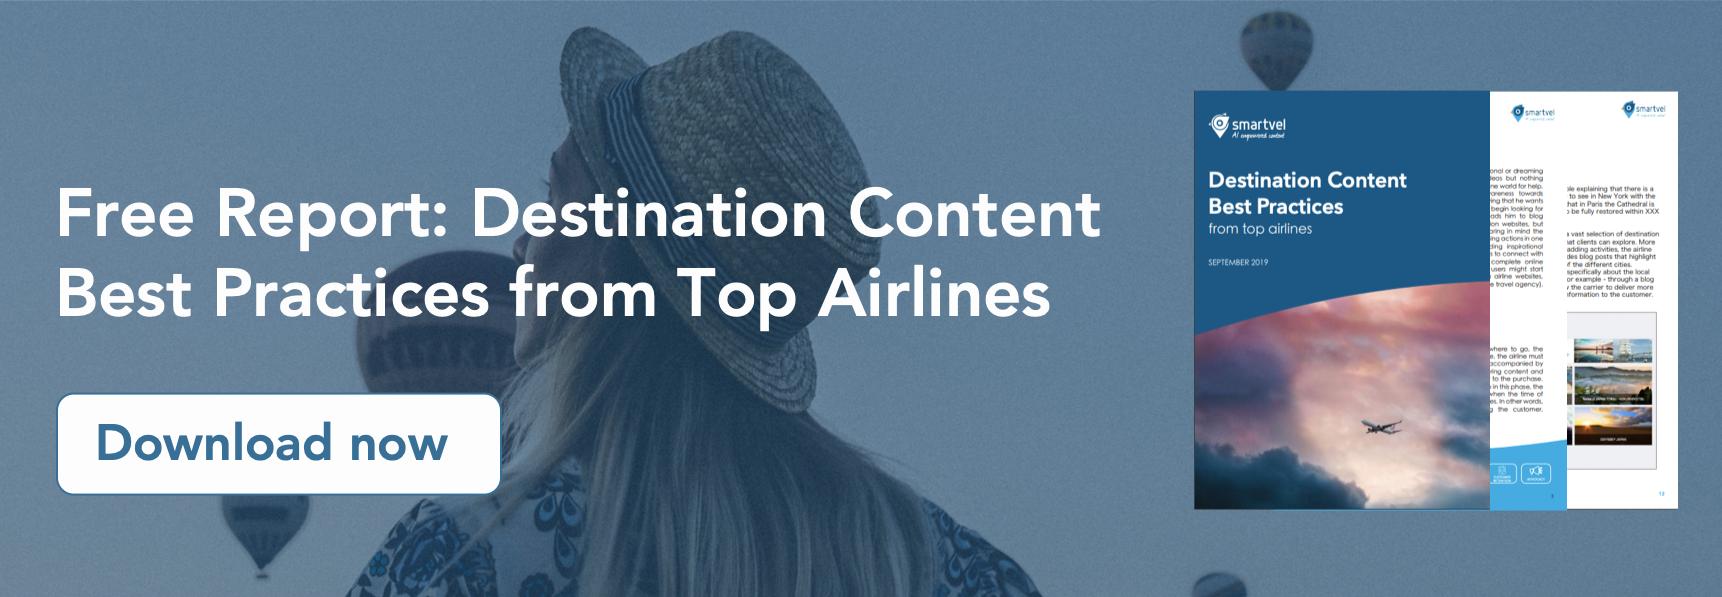 airlines best practices content